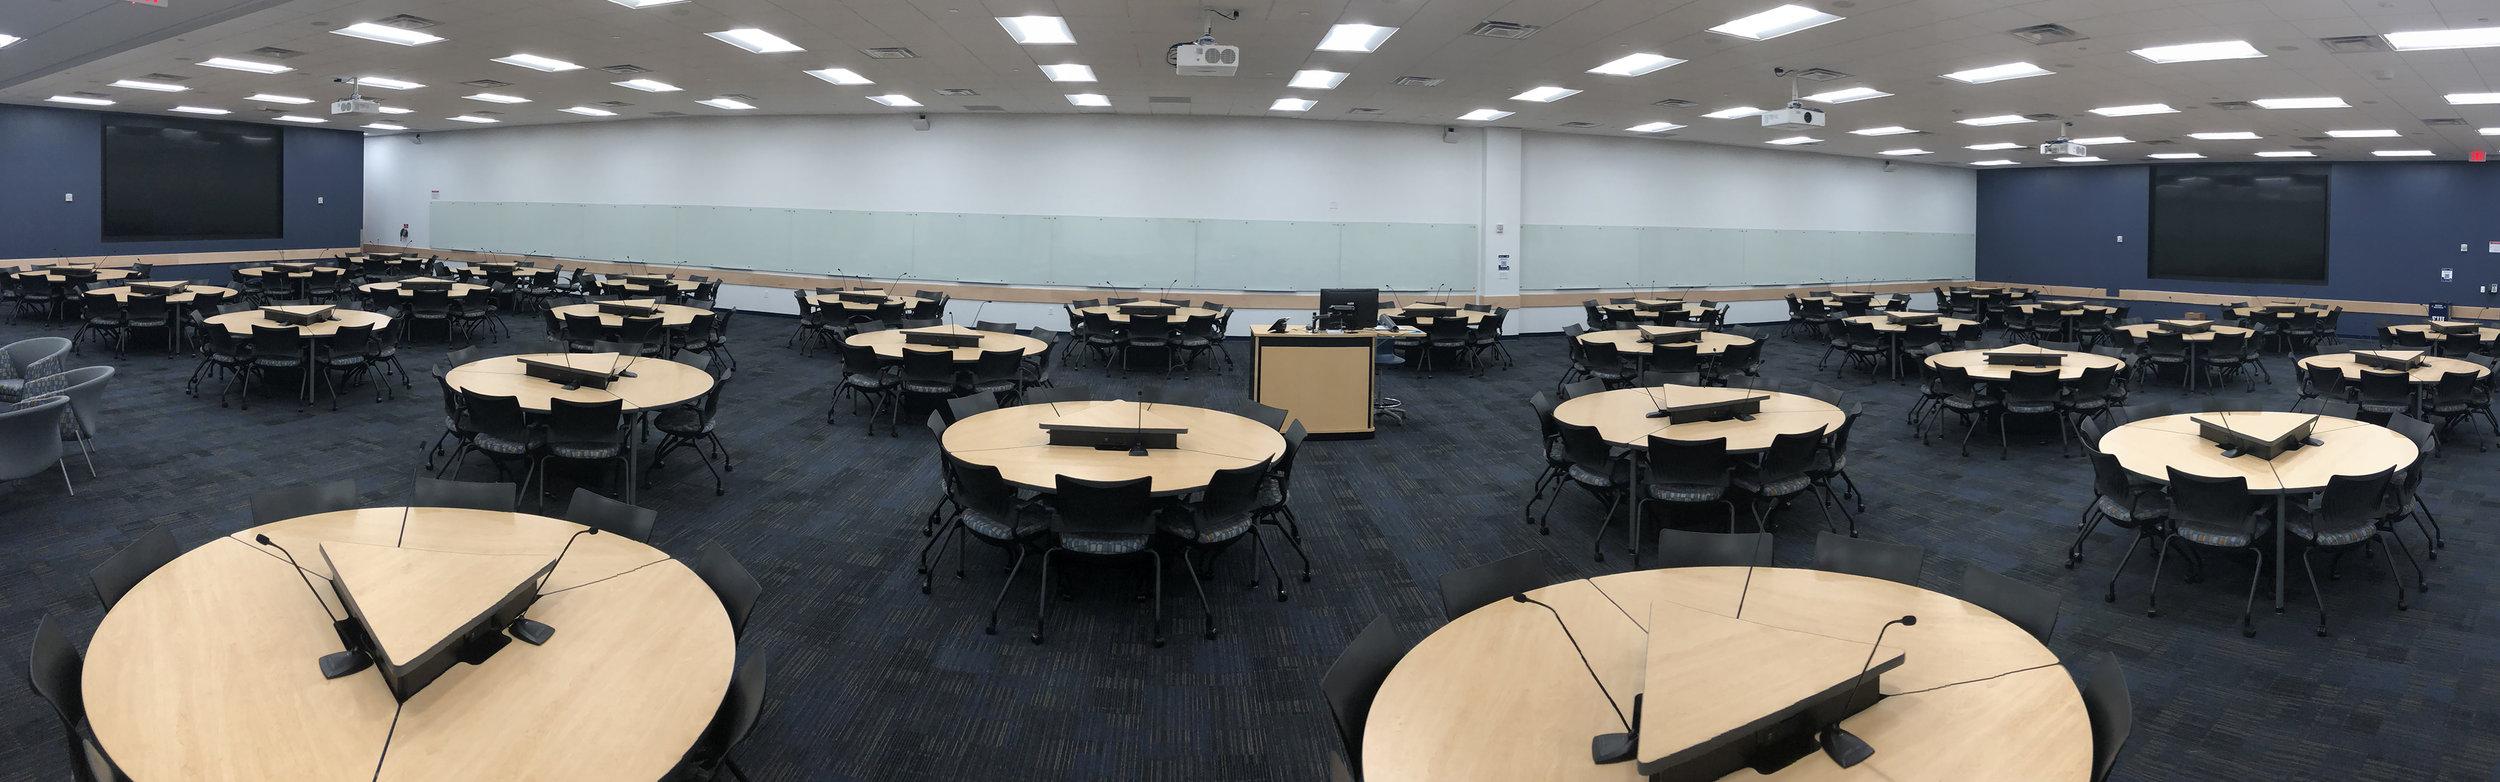 Florida International University - Install Pic 18.jpg